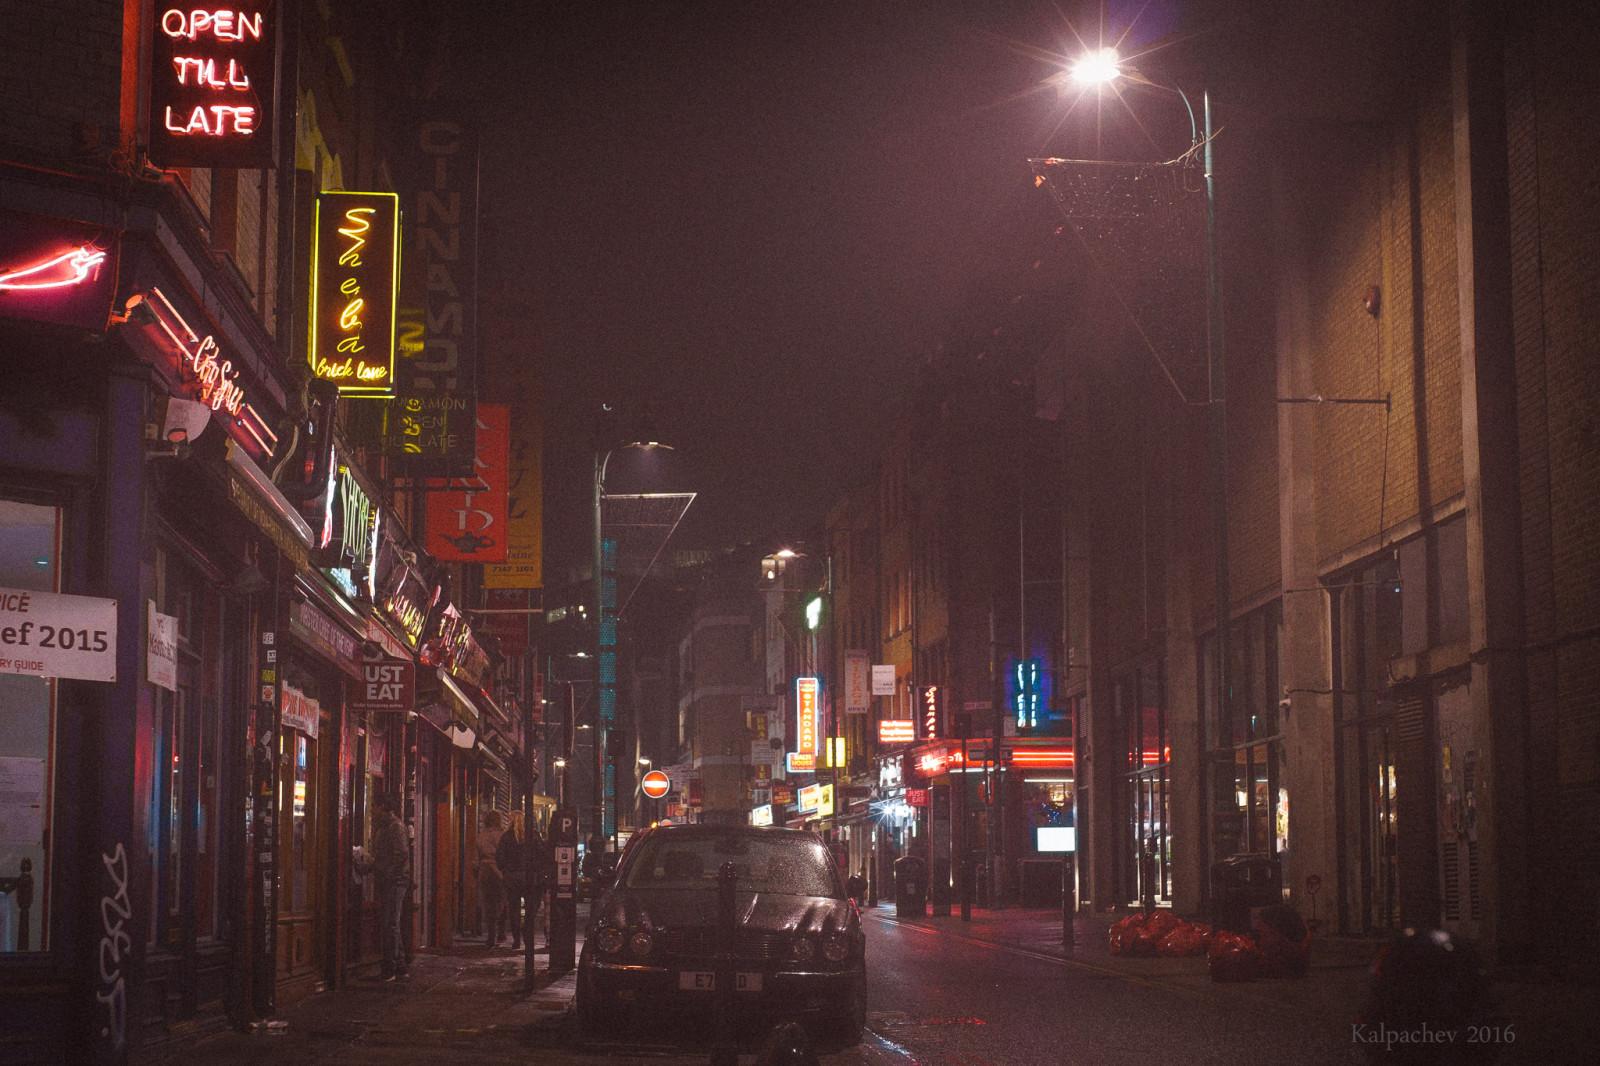 Brick lane by night